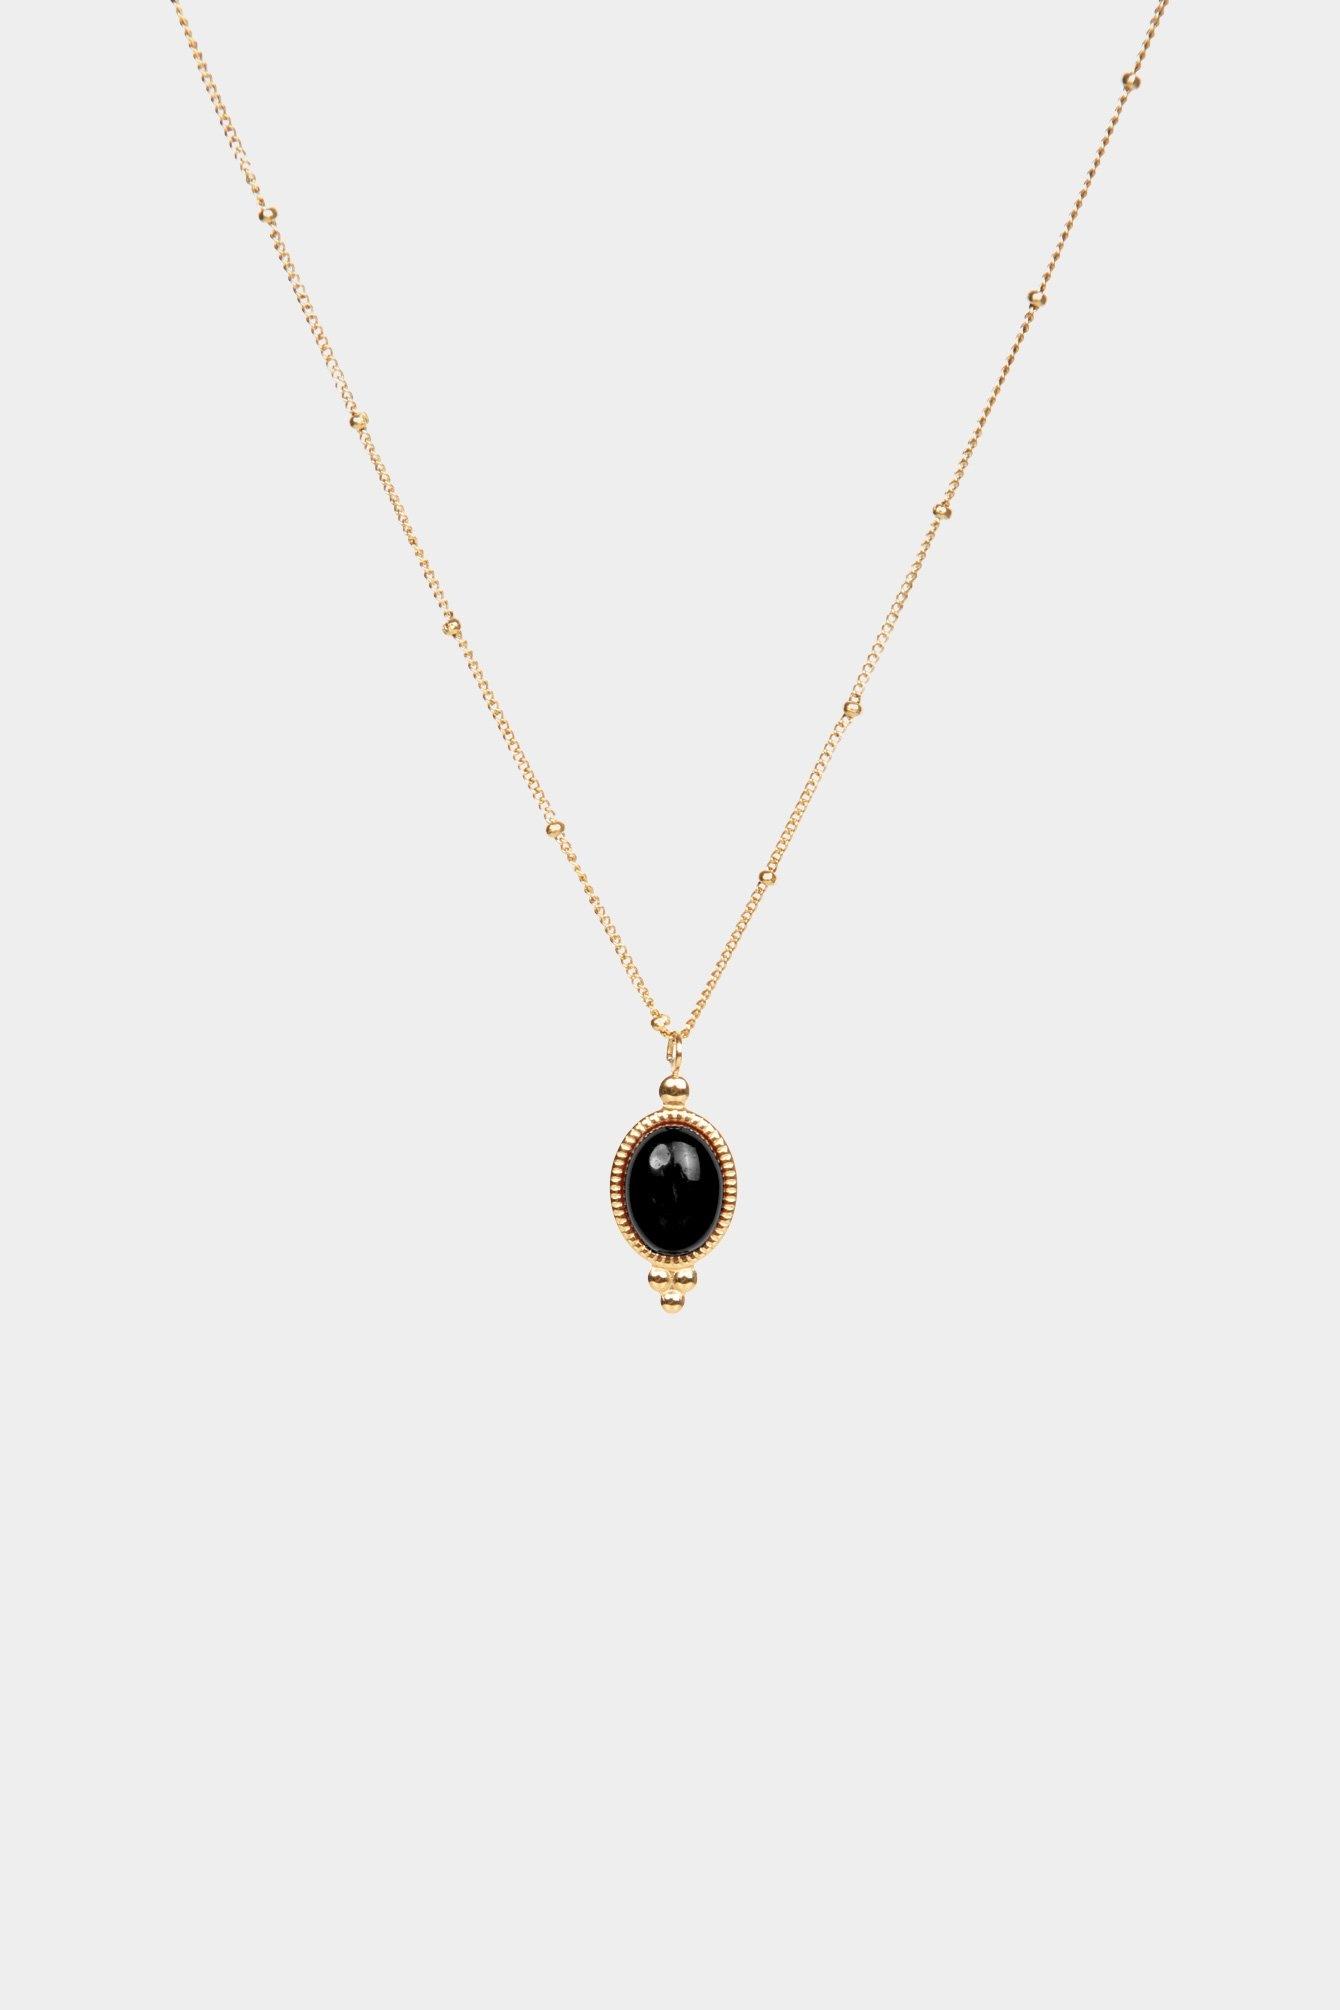 Stone black necklace